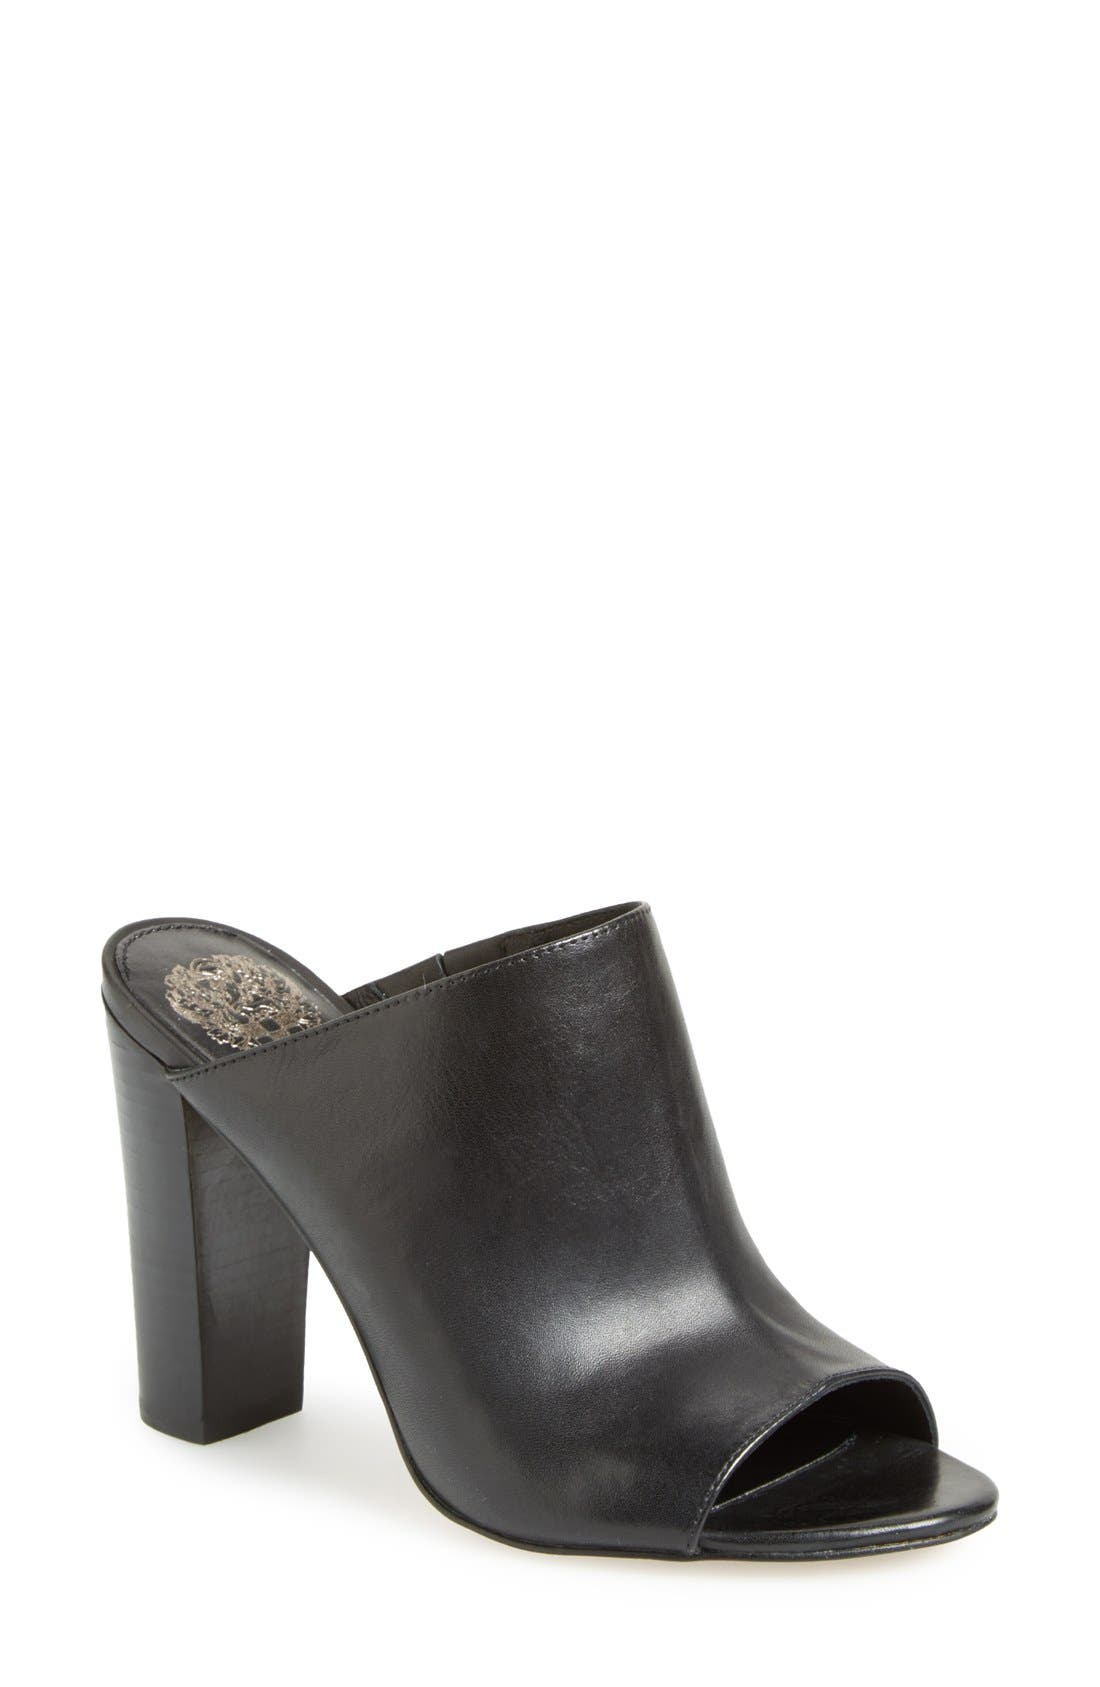 VINCE CAMUTO, 'Vestata' Leather Peep Toe Mule, Main thumbnail 1, color, 001